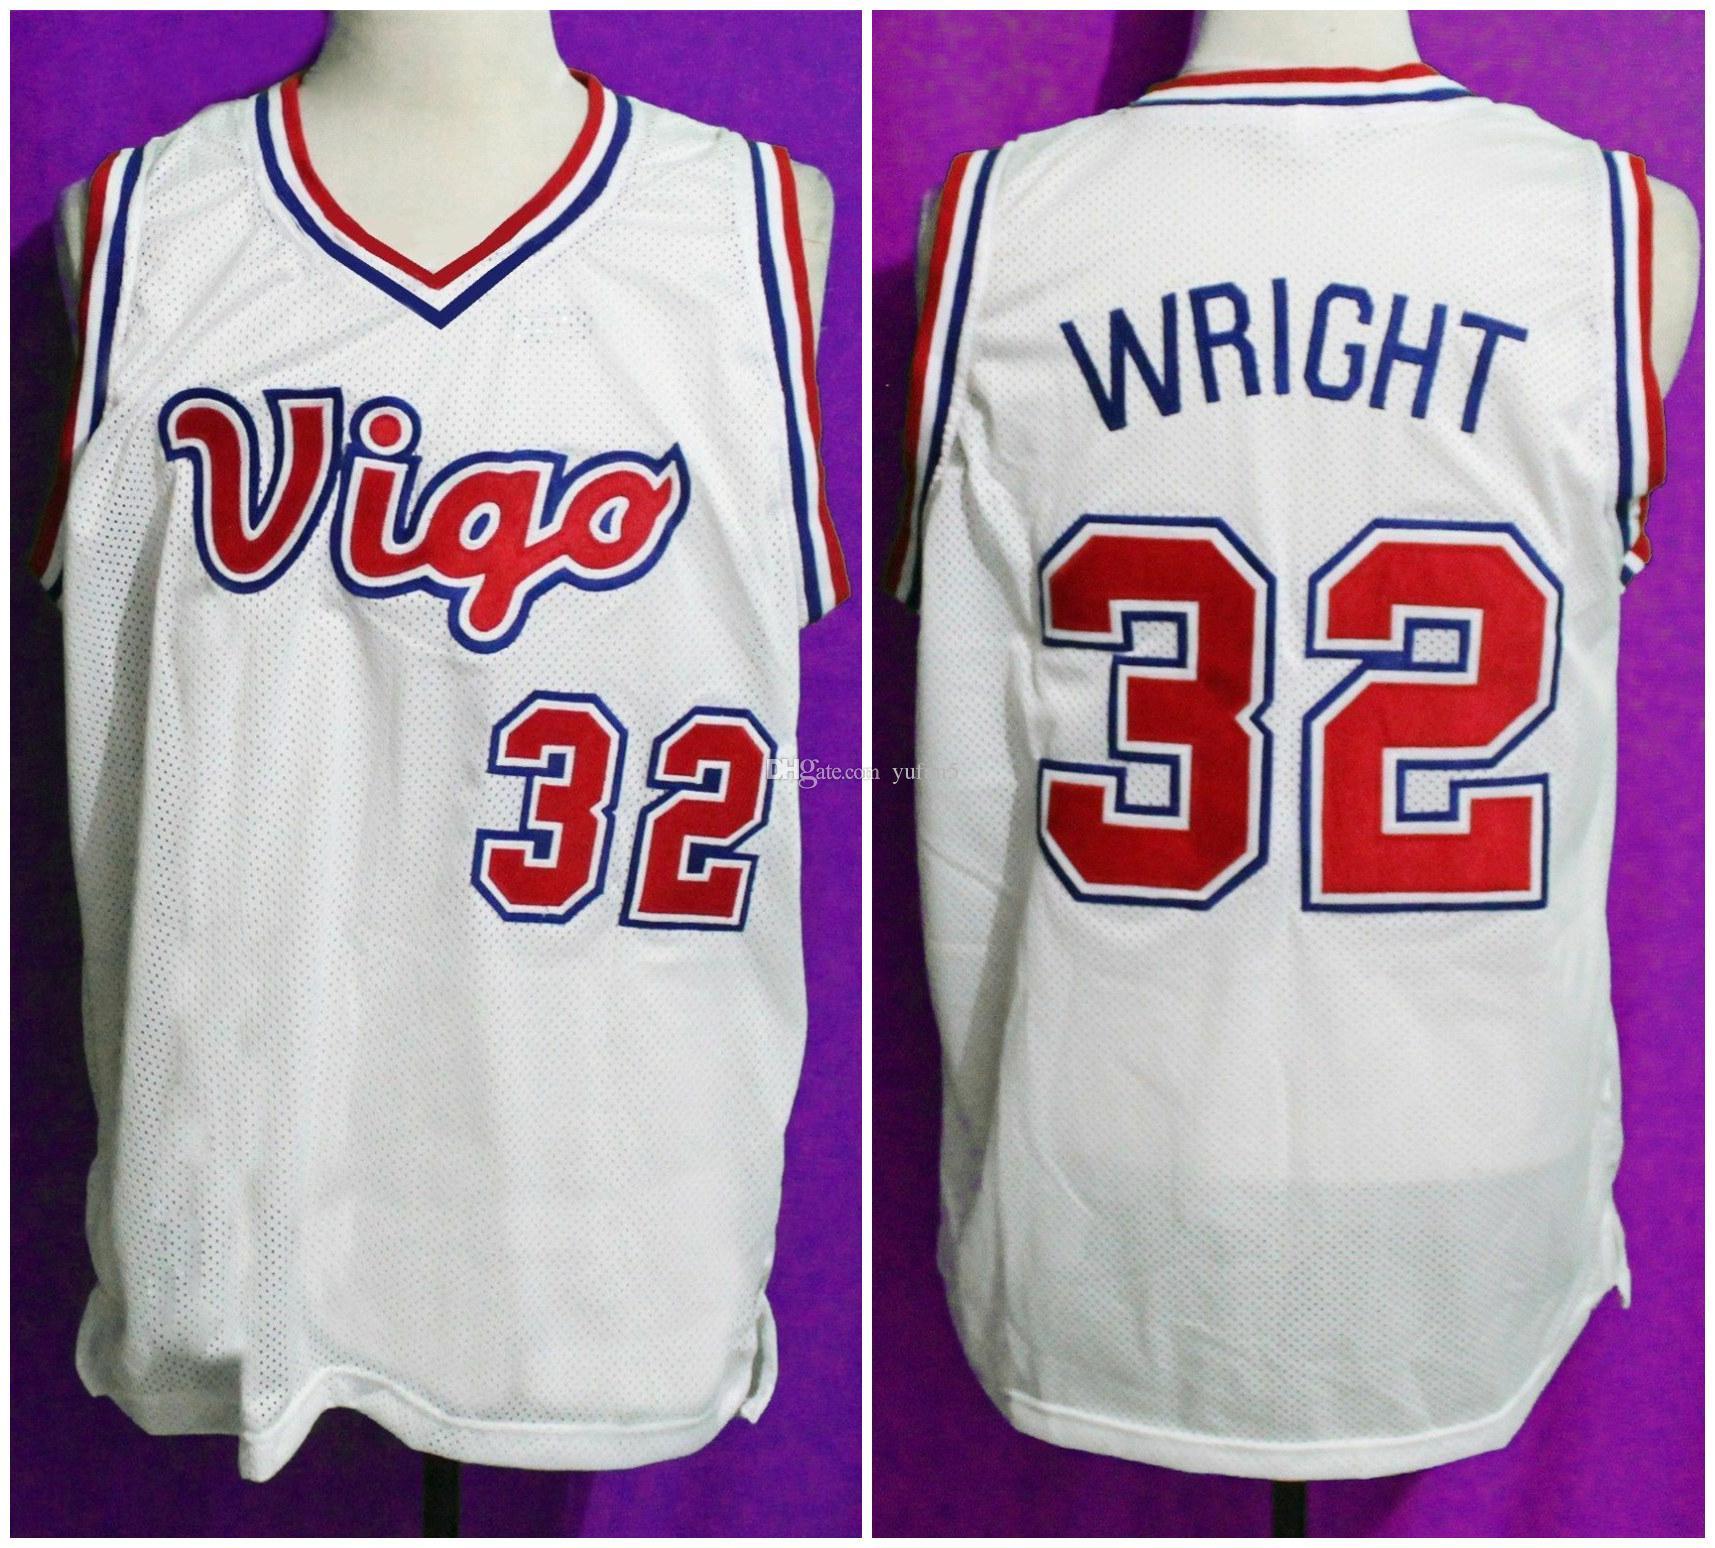 sports shoes 25f02 14117 #32 Monica Wright Vigo Retro Basketball Jersey Mens Stitched Custom Any  Number Name Jerseys